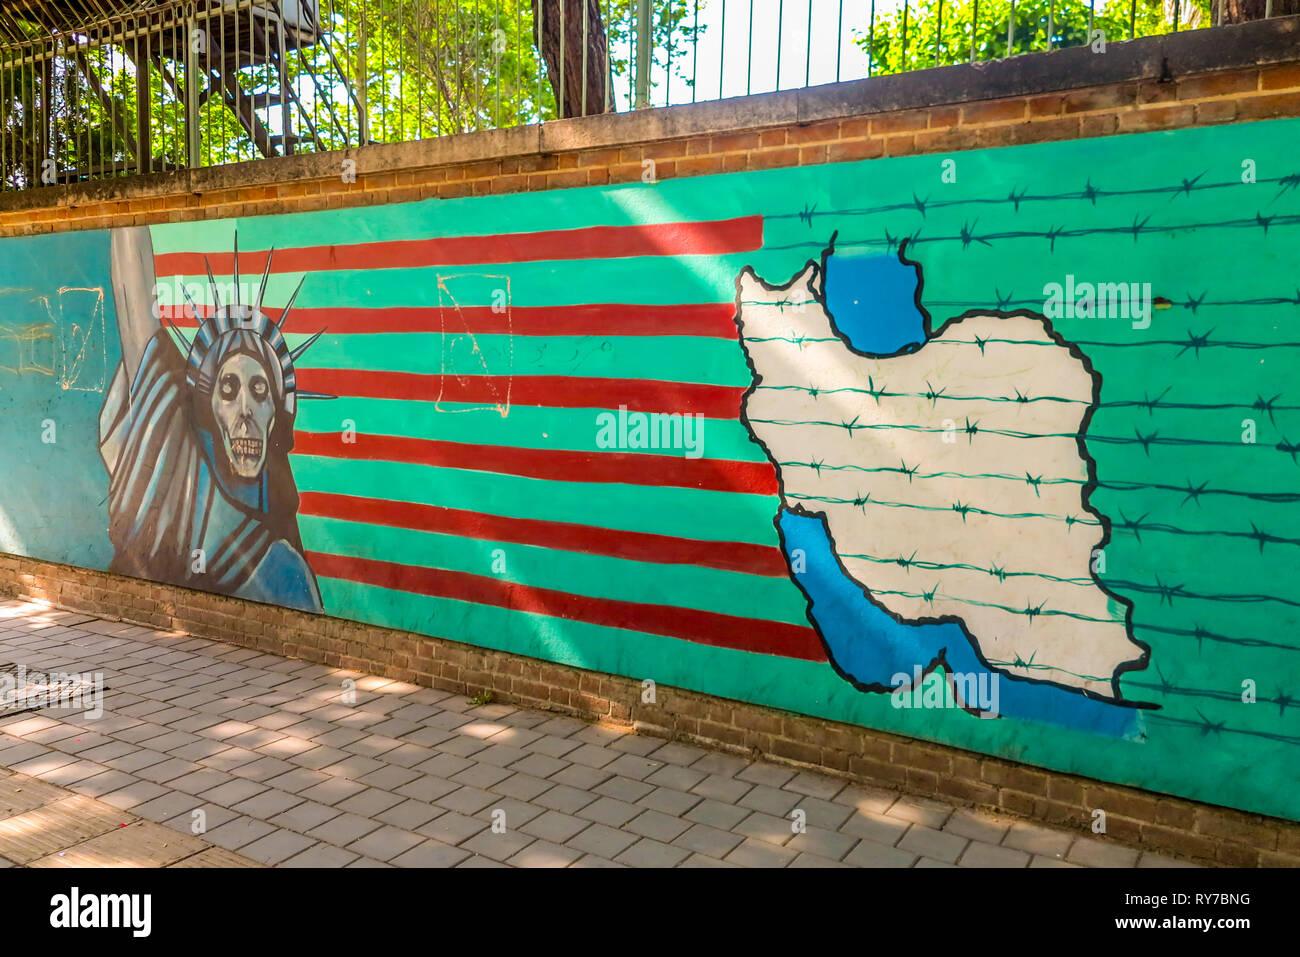 Tehran US Den of Espionage Former United States of America Embassy Anti American Iranian Patriotic Propaganda Statue of Liberty Stripes Barbed Wire - Stock Image